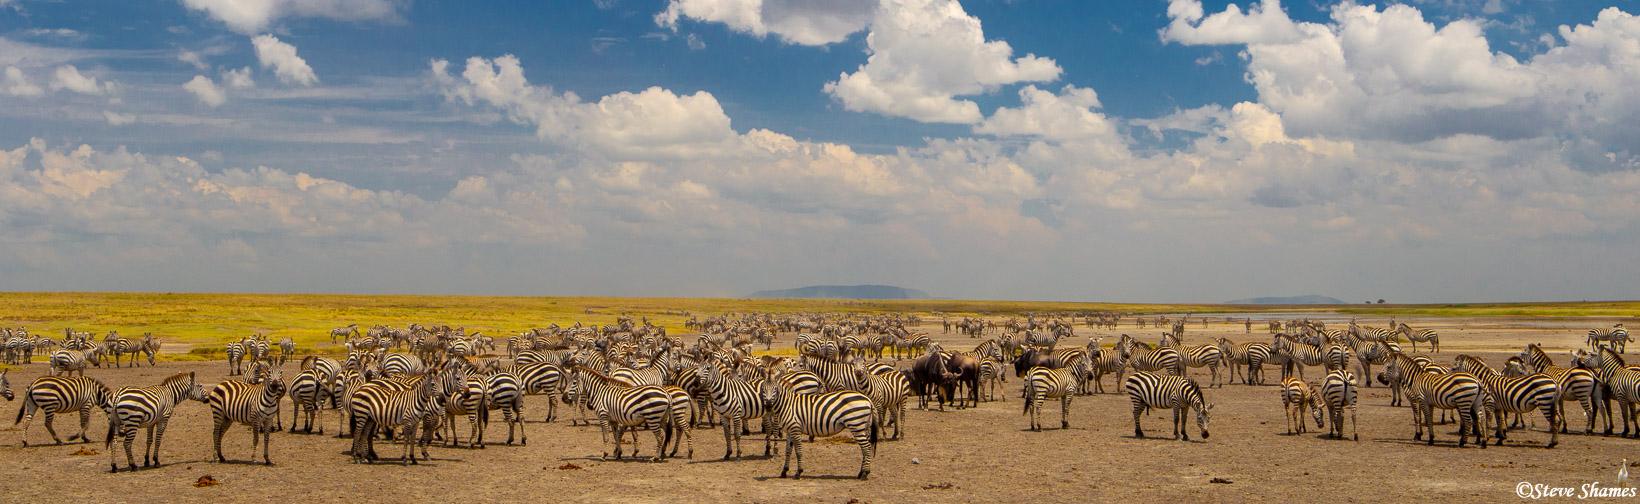 serengeti, national park, tanzania, zebras, waterhole, photo